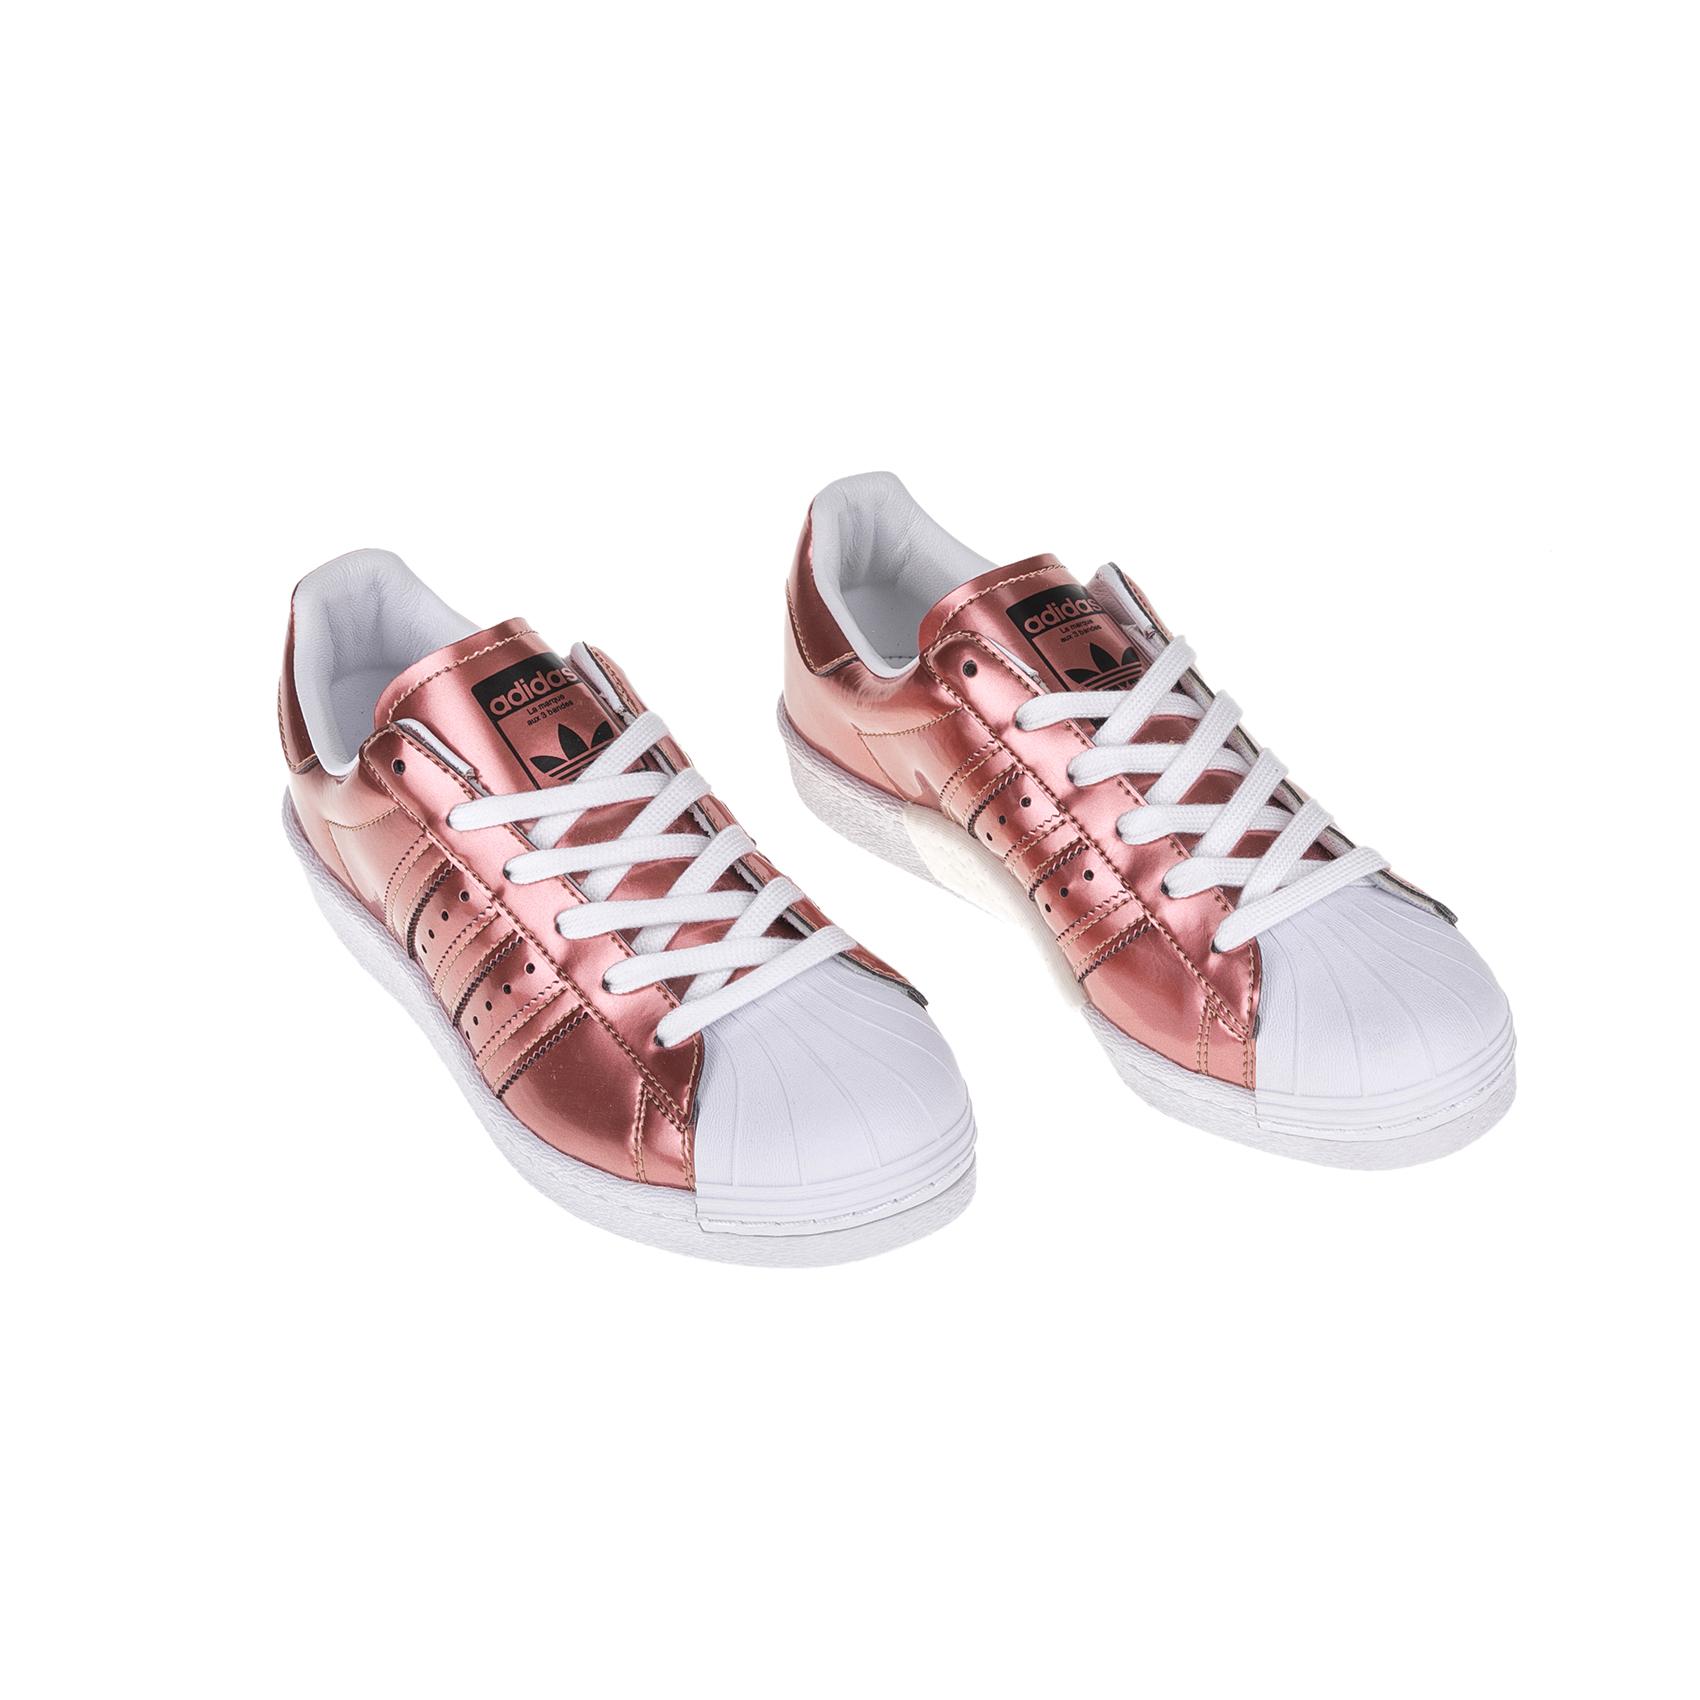 c040e72b2c7 adidas Originals - Γυναικεία sneakers adidas SUPERSTAR μεταλλικά, Γυναικεία  sneakers, ΓΥΝΑΙΚΑ | ΠΑΠΟΥΤΣΙΑ | SNEAKERS